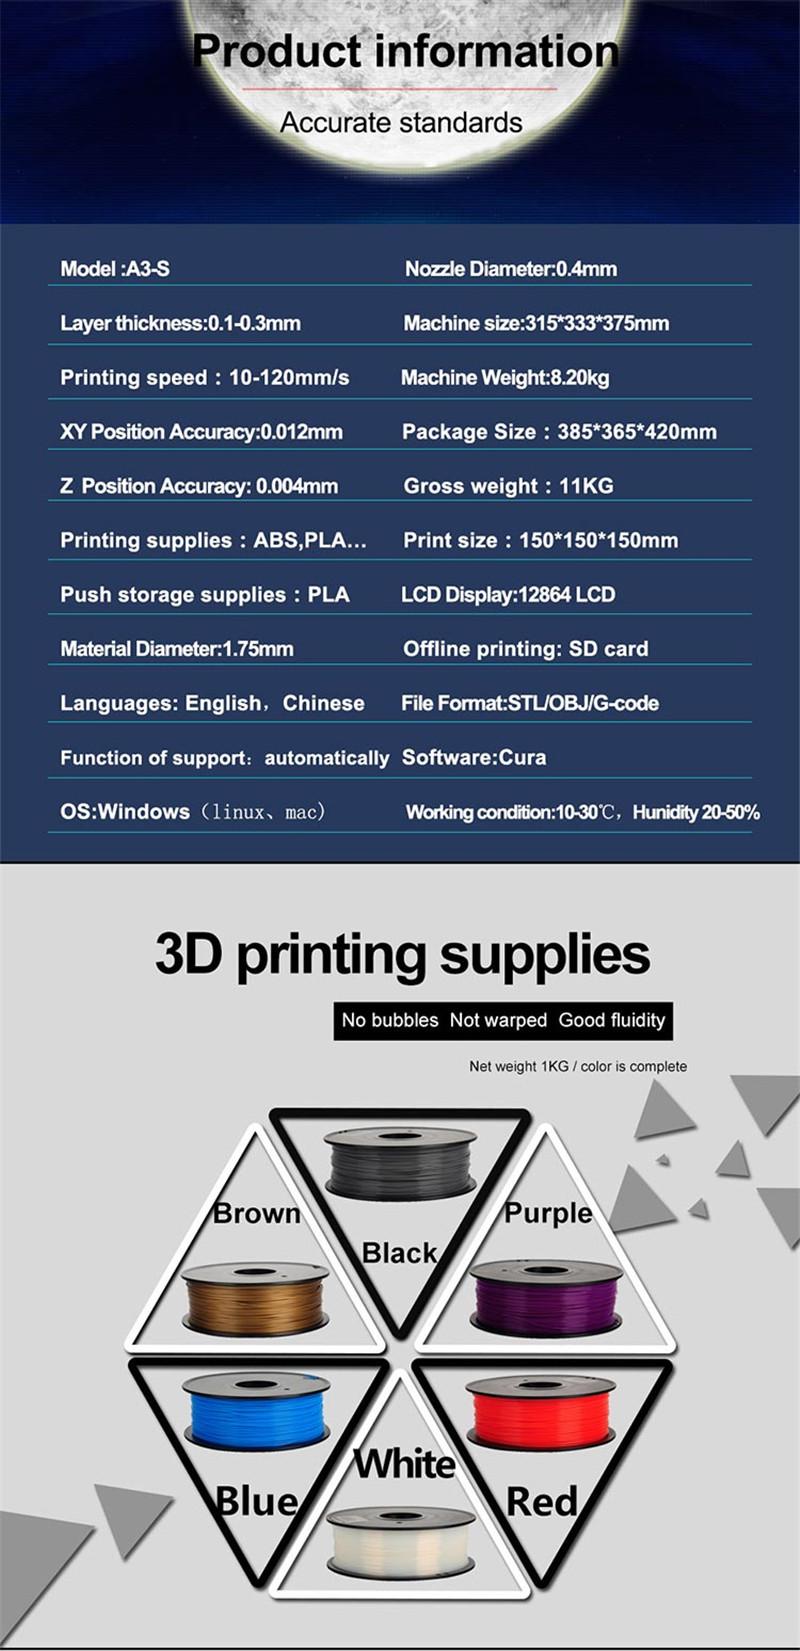 Anet A3S Desktop 3D Printer Aluminum Composite Panel Casing with 1kg filament Printing Size 150*150*150MM